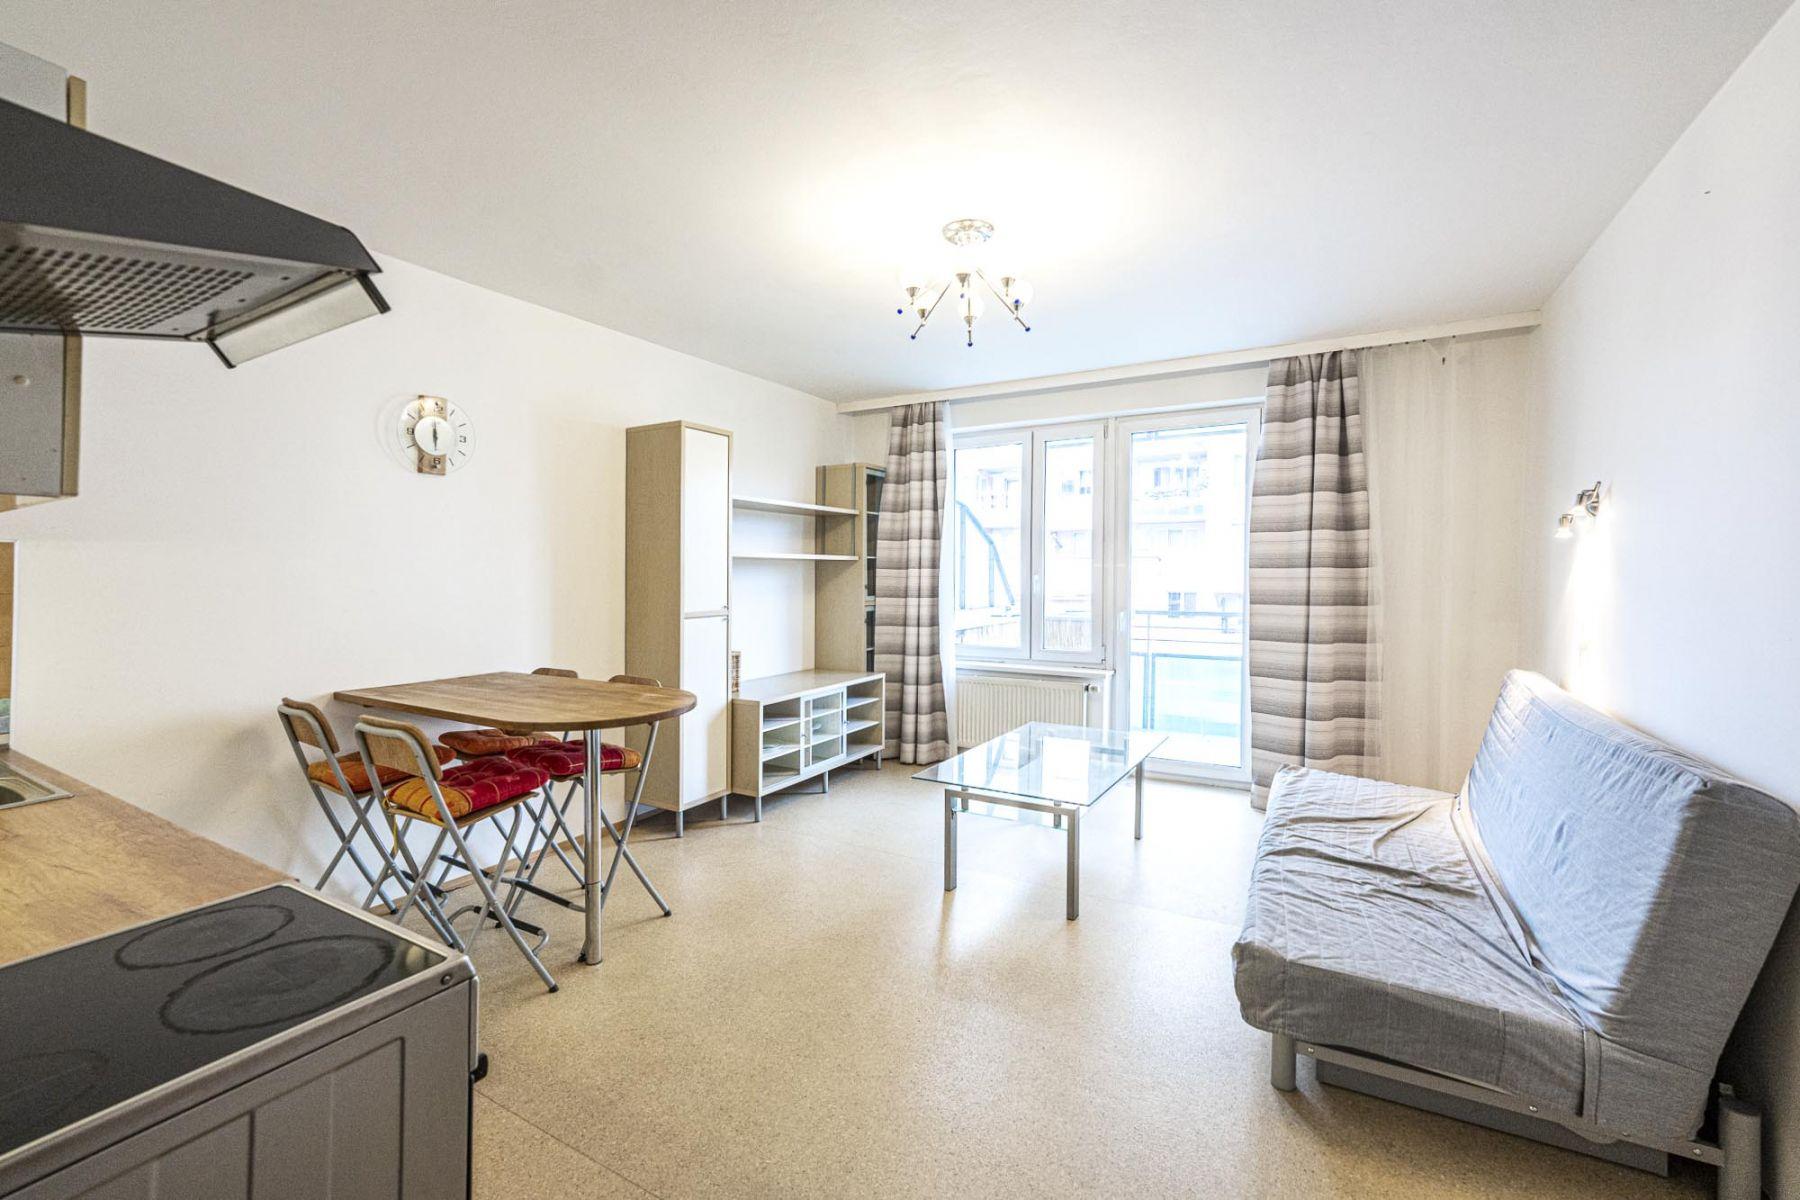 Pěkný zařízený byt 2+kk, 54 m2, novostavba, u metra Hůrka